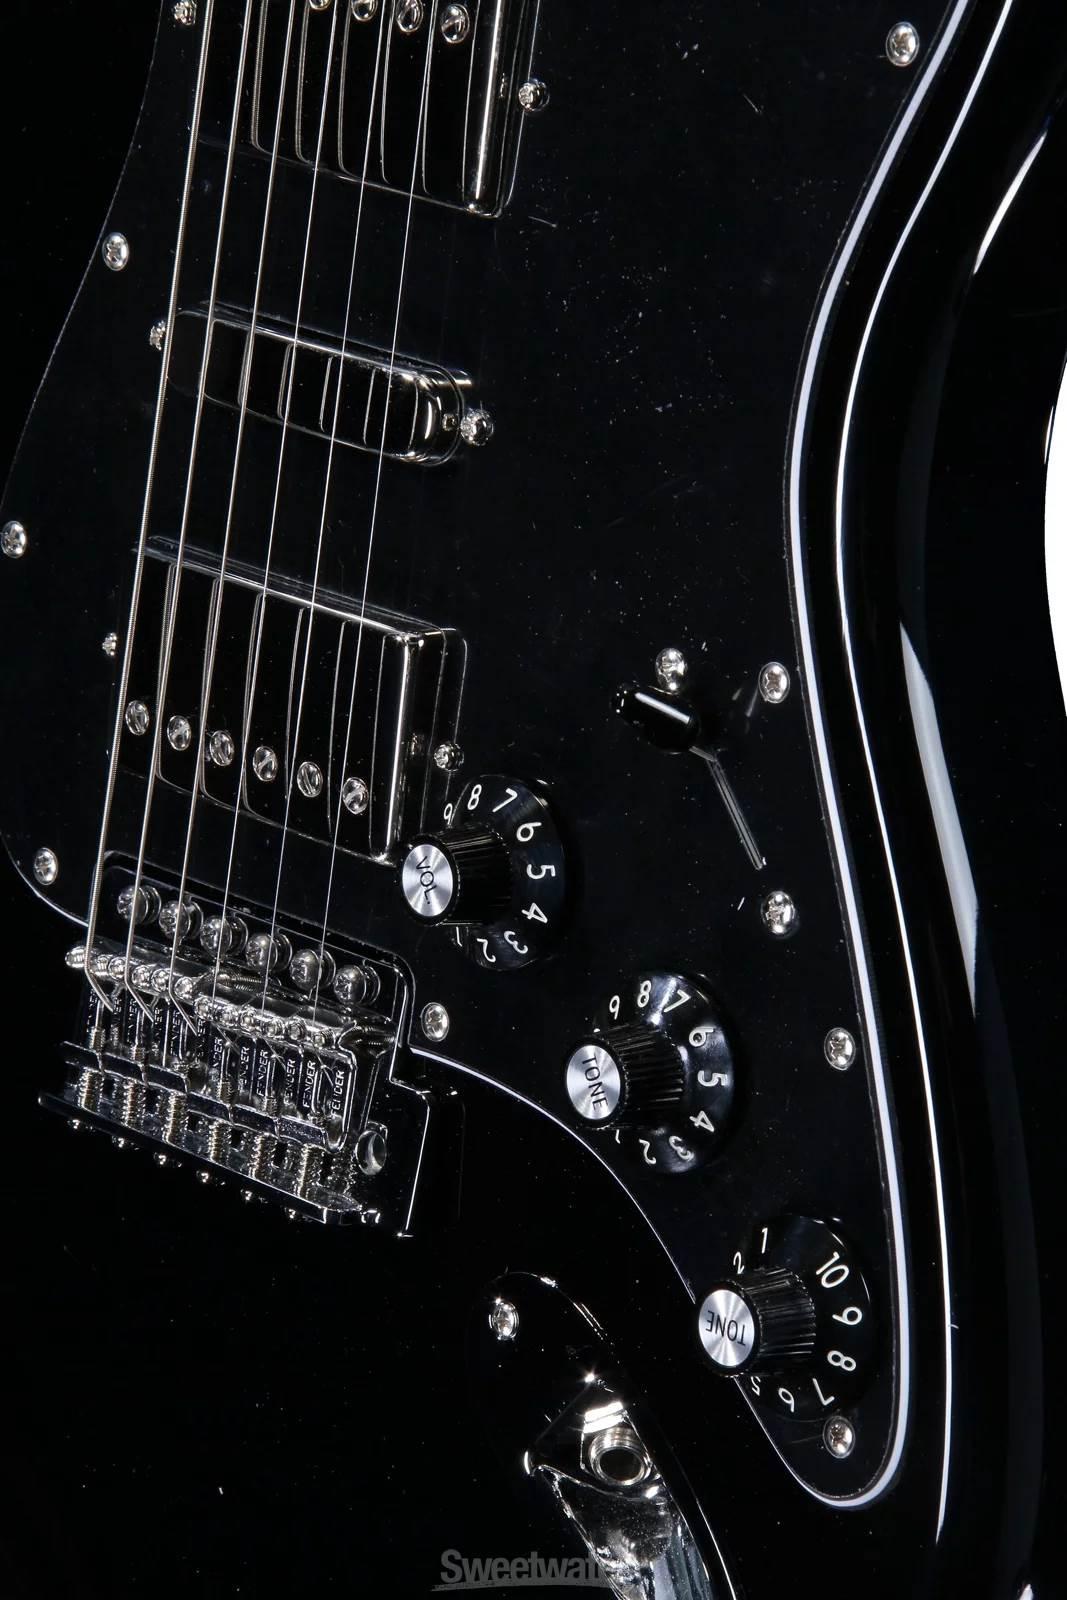 Blacktop Stratocaster HSH (MIM) - Fuzzfaced